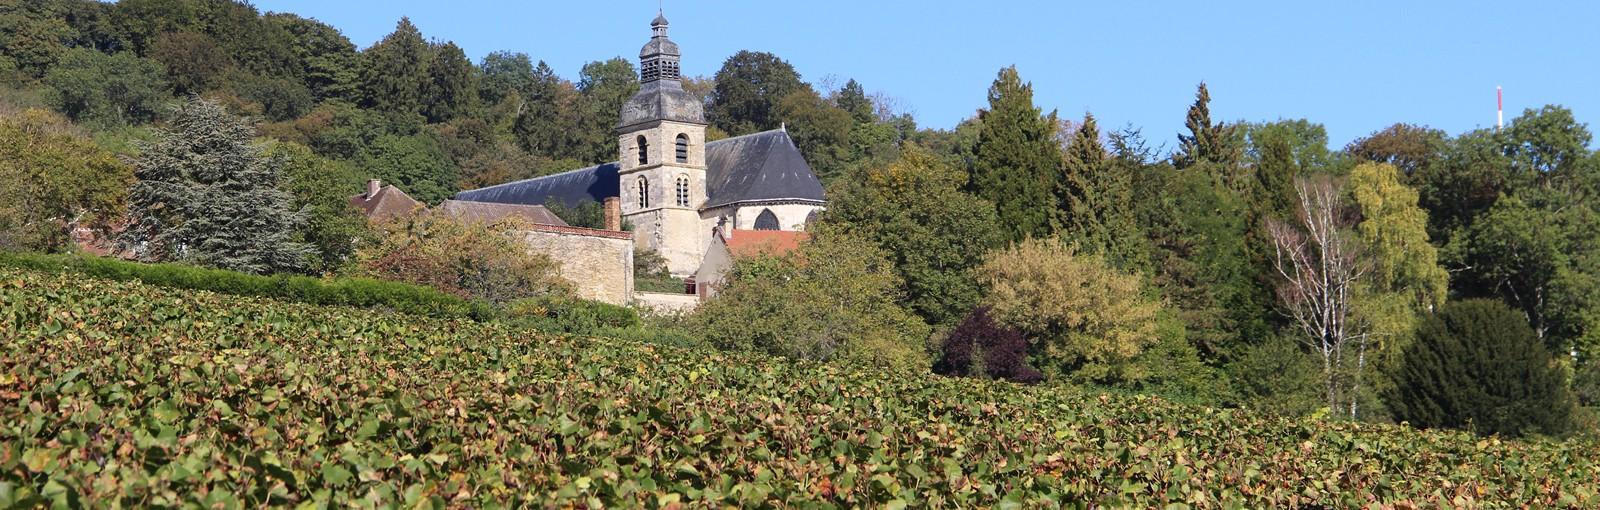 Tours Reims – Champaña - Días completos - Excursiones desde París